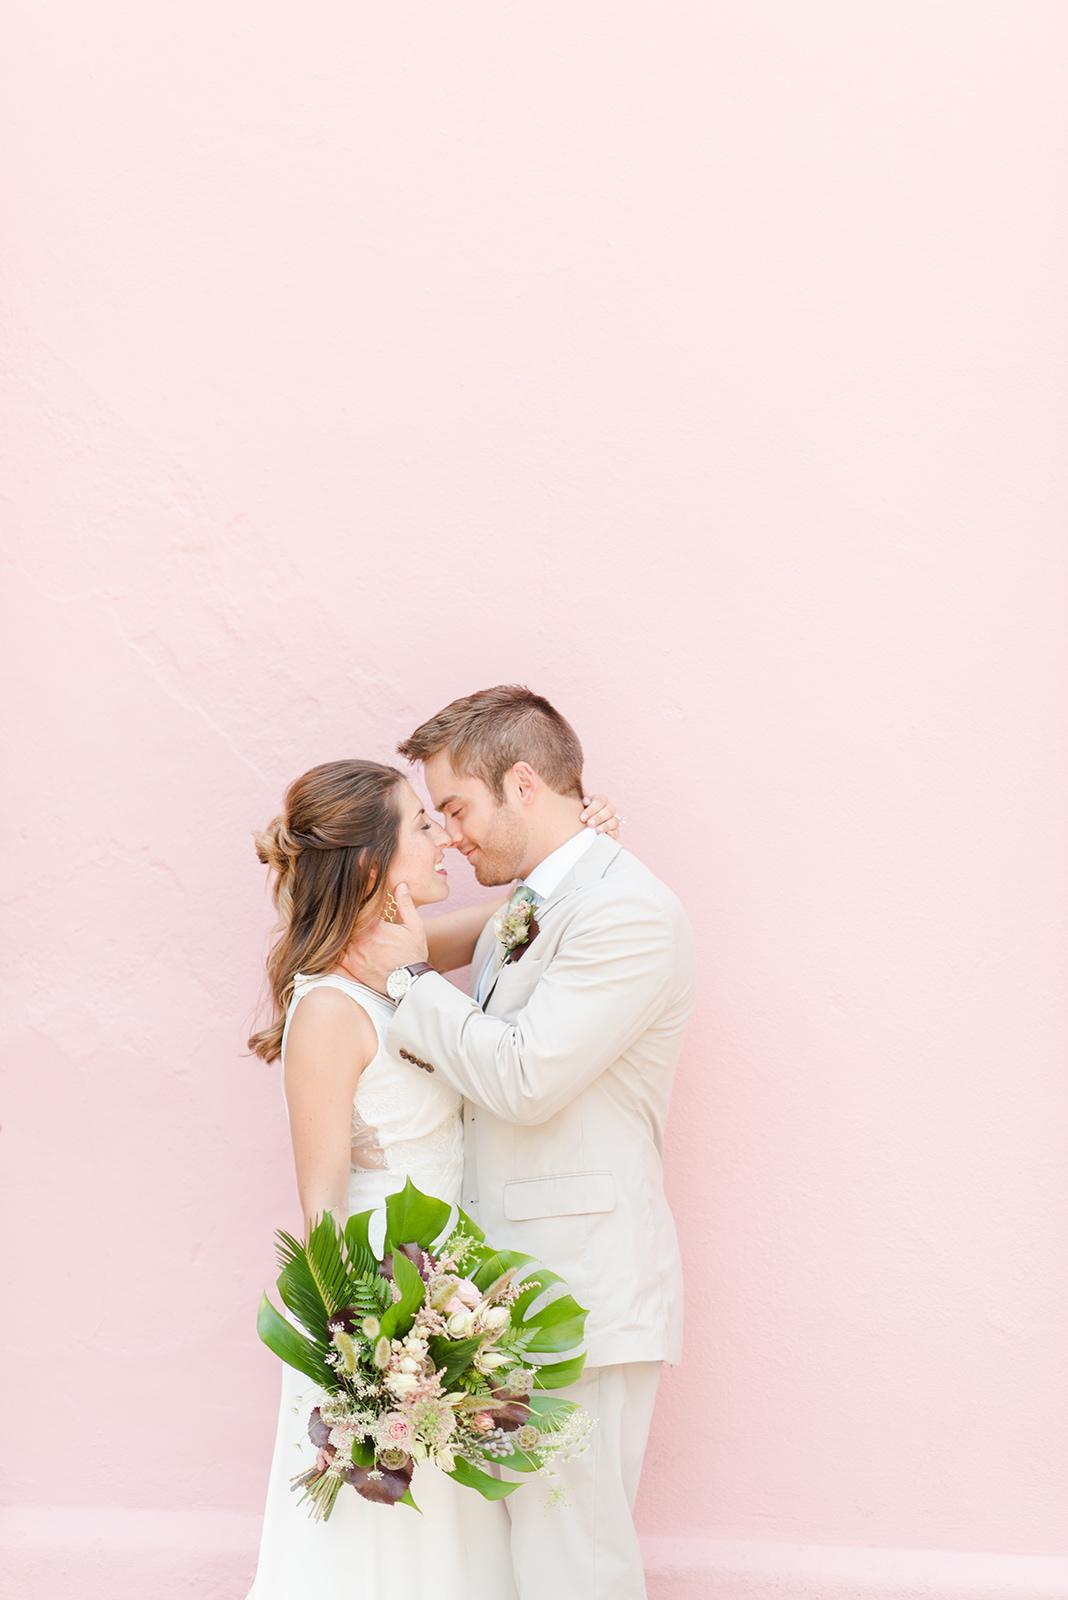 Pastel Romance Styled Shoot at Society Hall, Charleston, South Carolina | Palmetto State Weddings